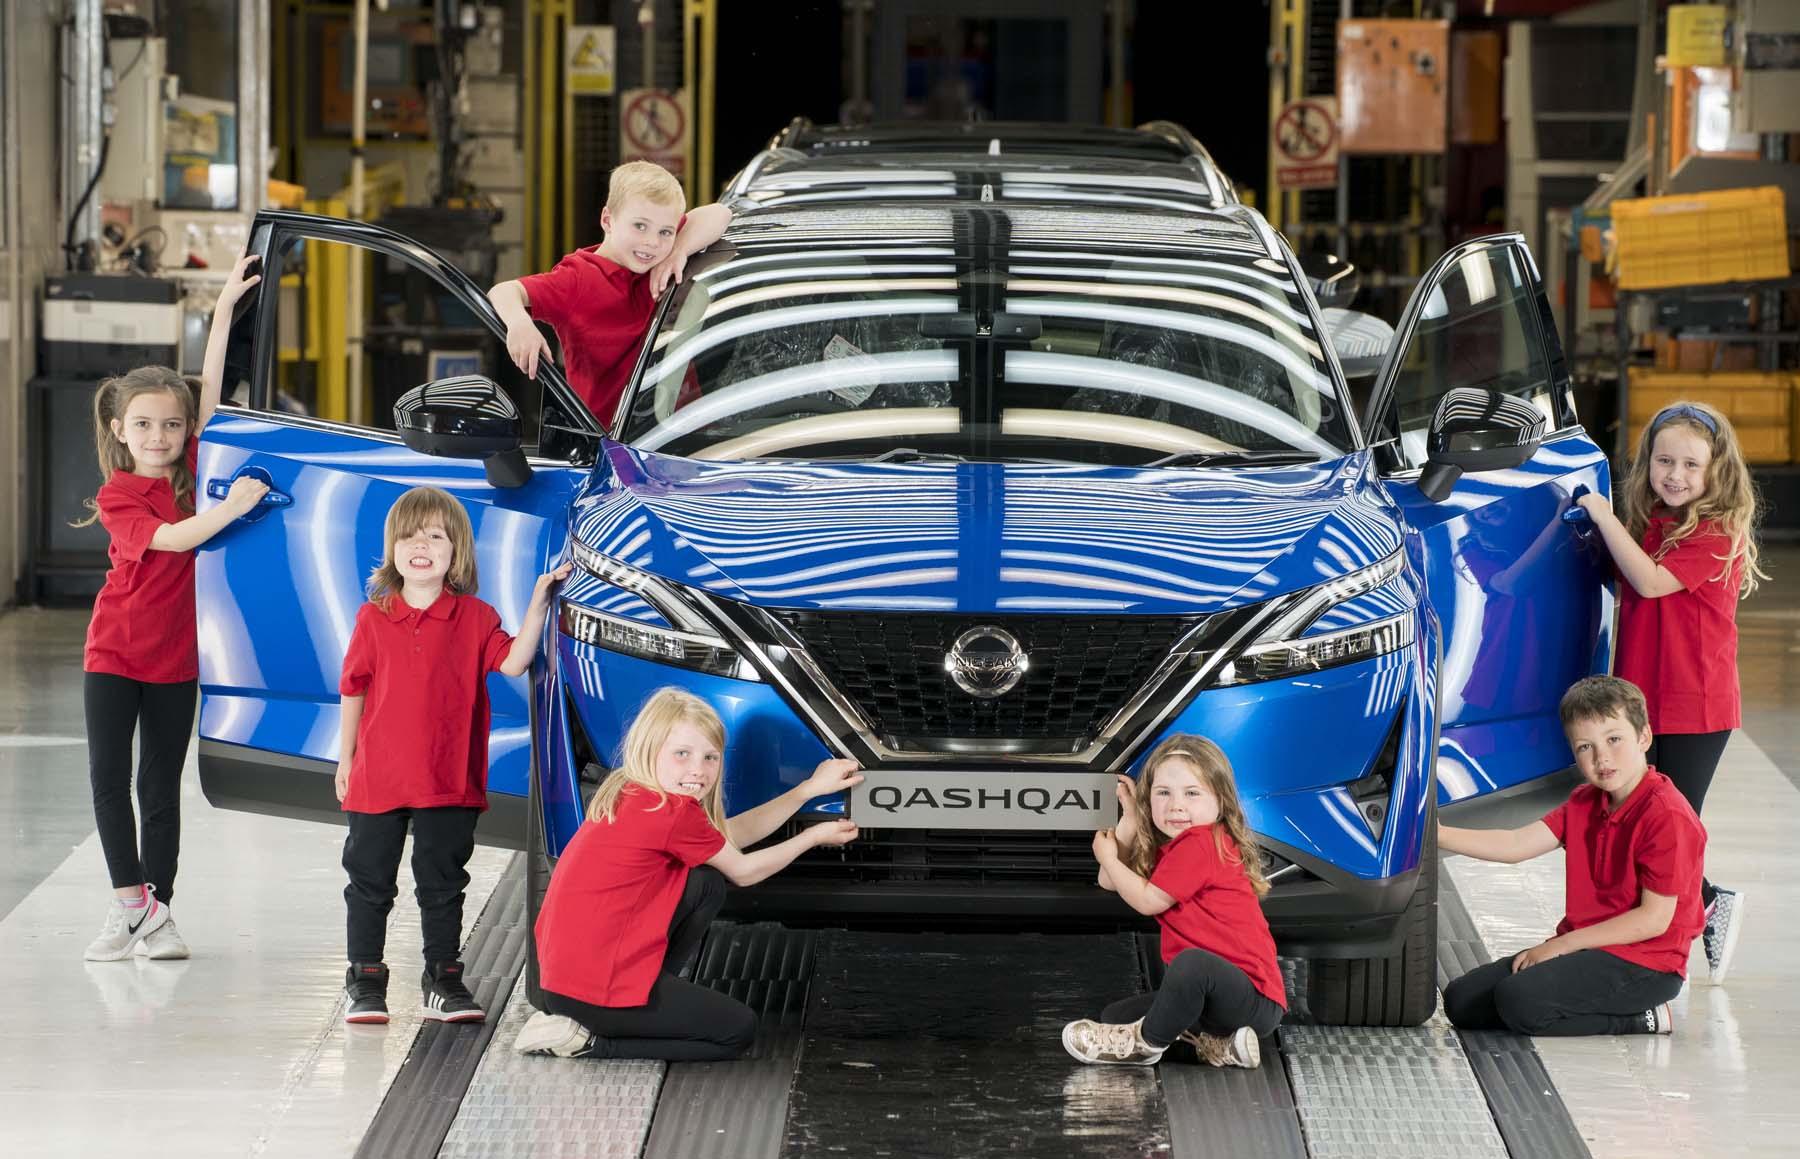 RR NISSAN YOUNG INSPECTORS 22 Nissan : ξεκινά την παραγωγή του νέου Qashqai και προσφέρει μια εμπειρία δεξιοτήτων σε κάθε μαθητή Nissan, Nissan Qashqai, Qashqai, ειδήσεις, Νέα